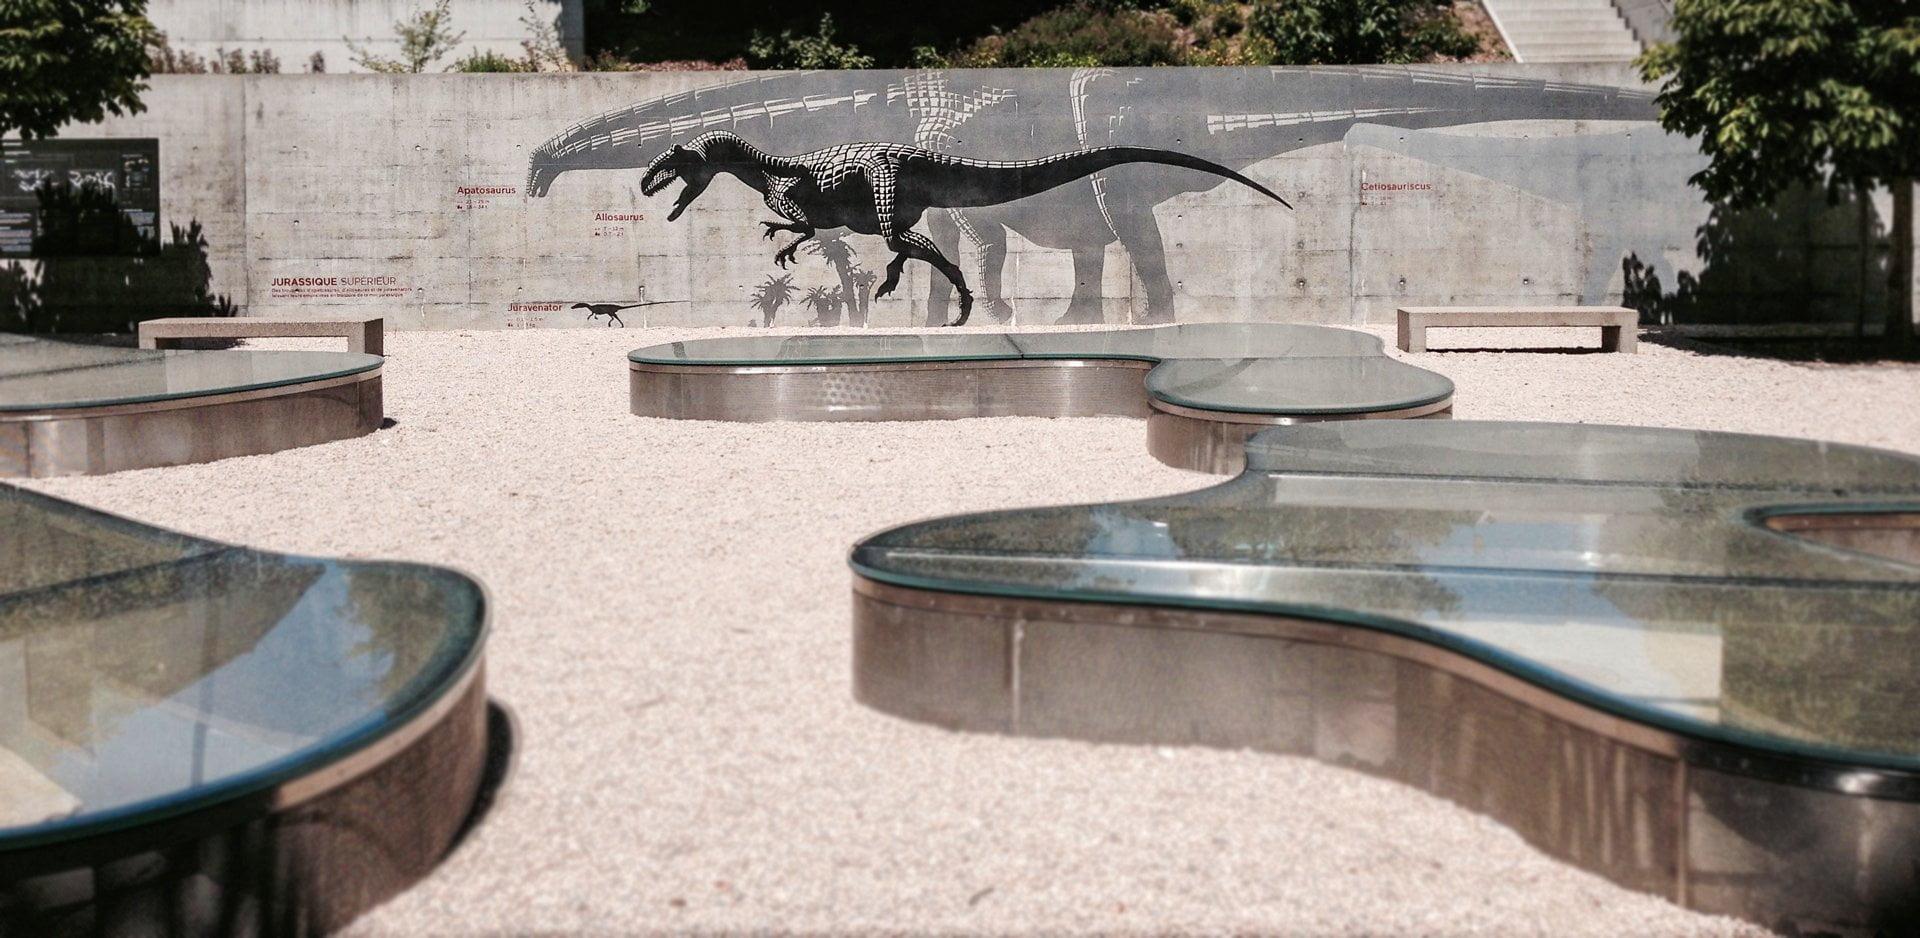 Dinotec, Jurassica, ikonaut